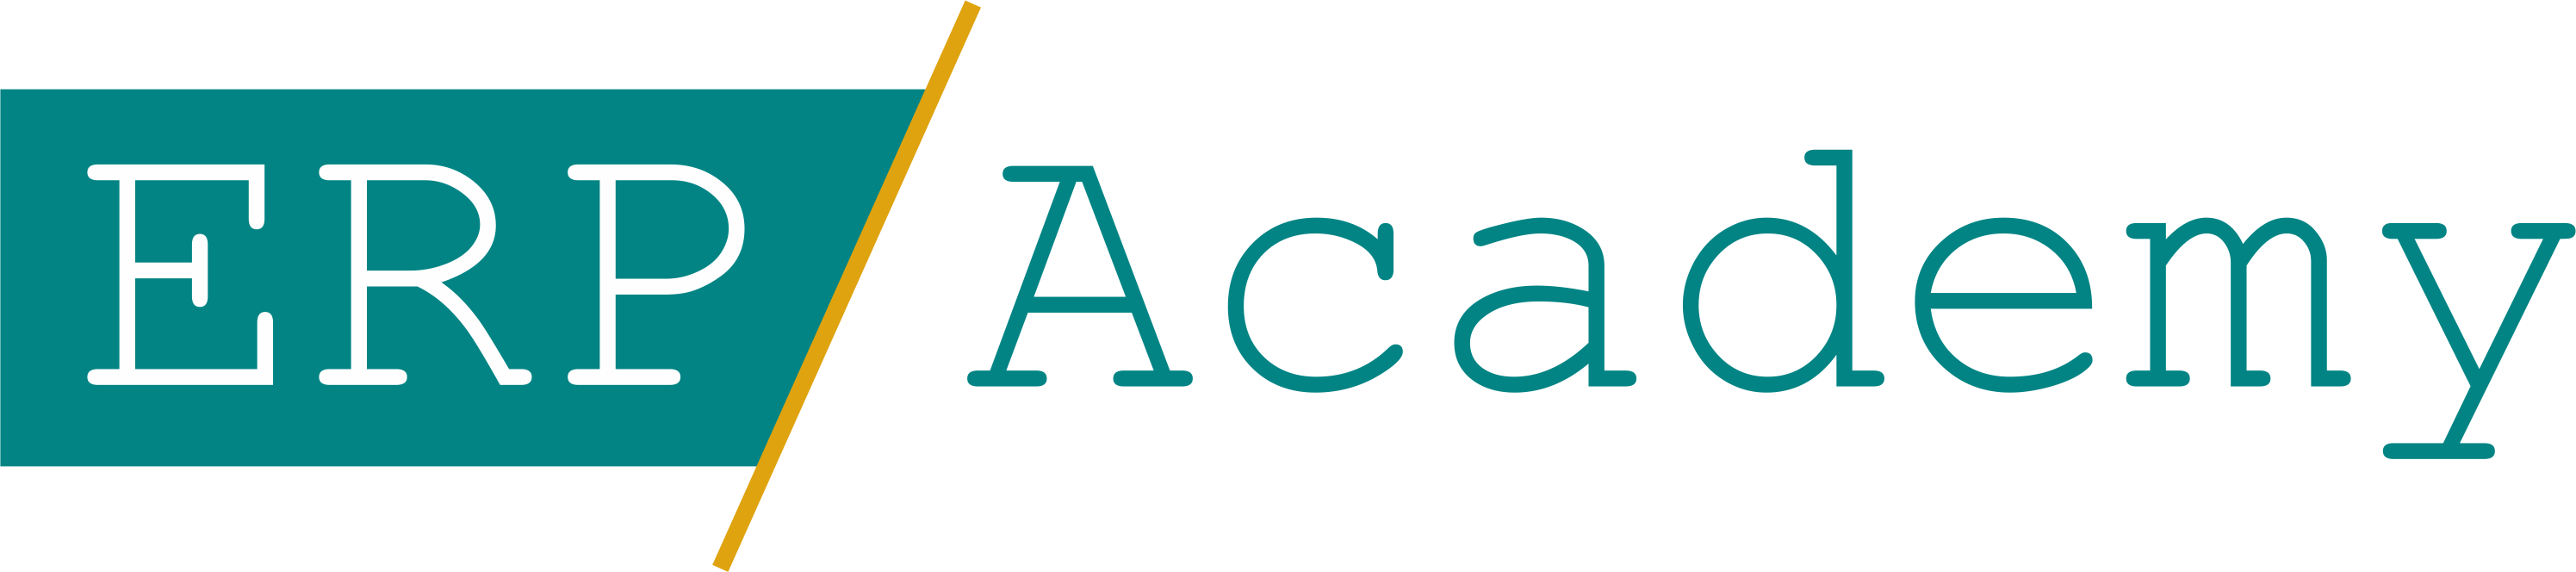 erp_academy_logo